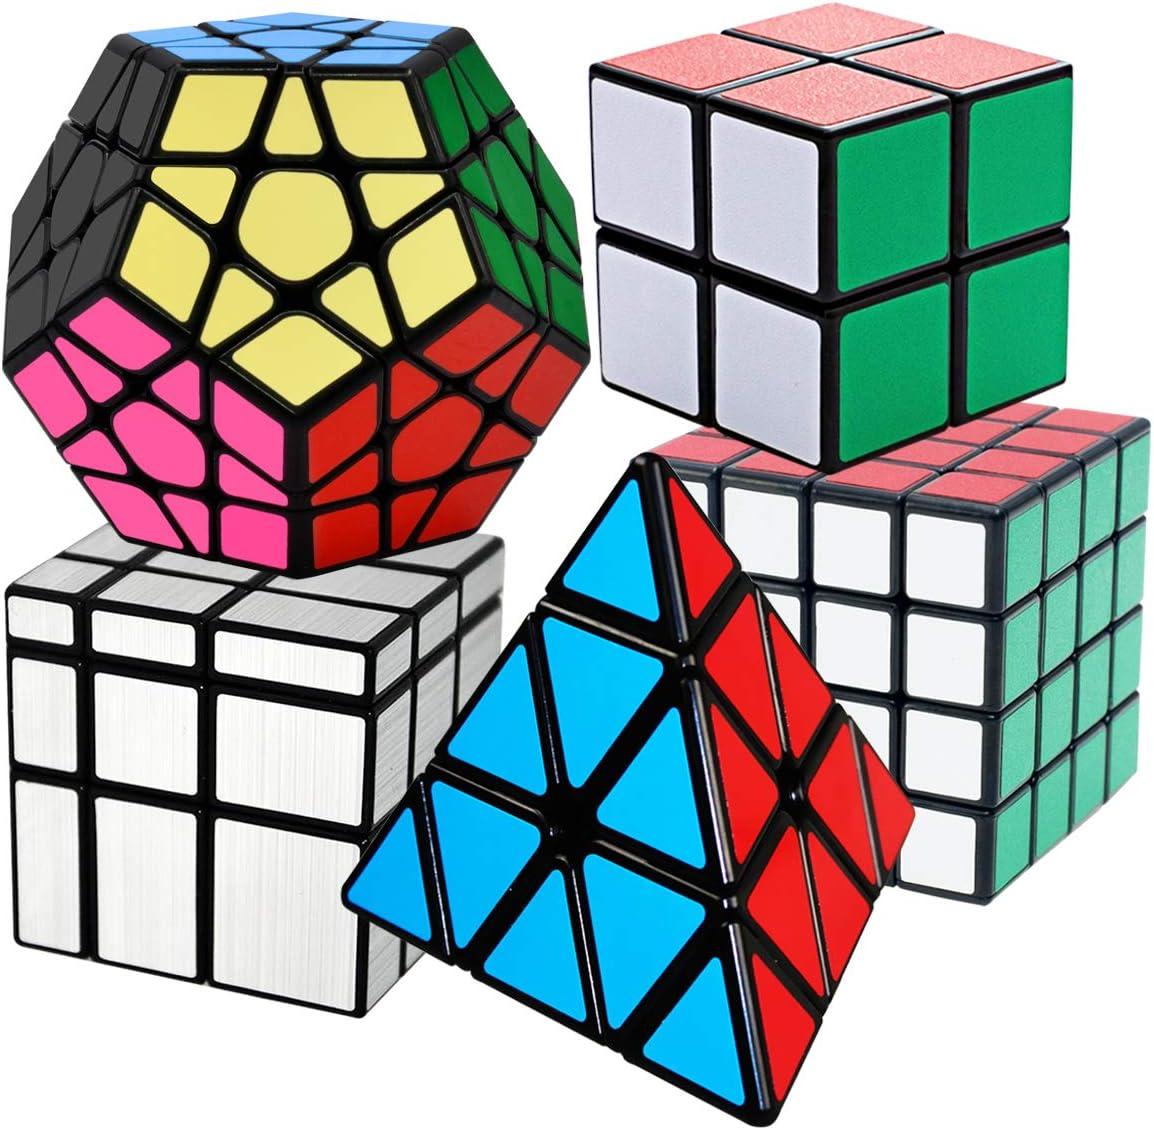 COOJA Cubo Mágico Pack, Speed Magic Cube 2x2x2 + 4x4x4 + Pyraminx + Megaminx + Cubo Espejo, Velocidad Rompecabeza Cubos con Easy Turning